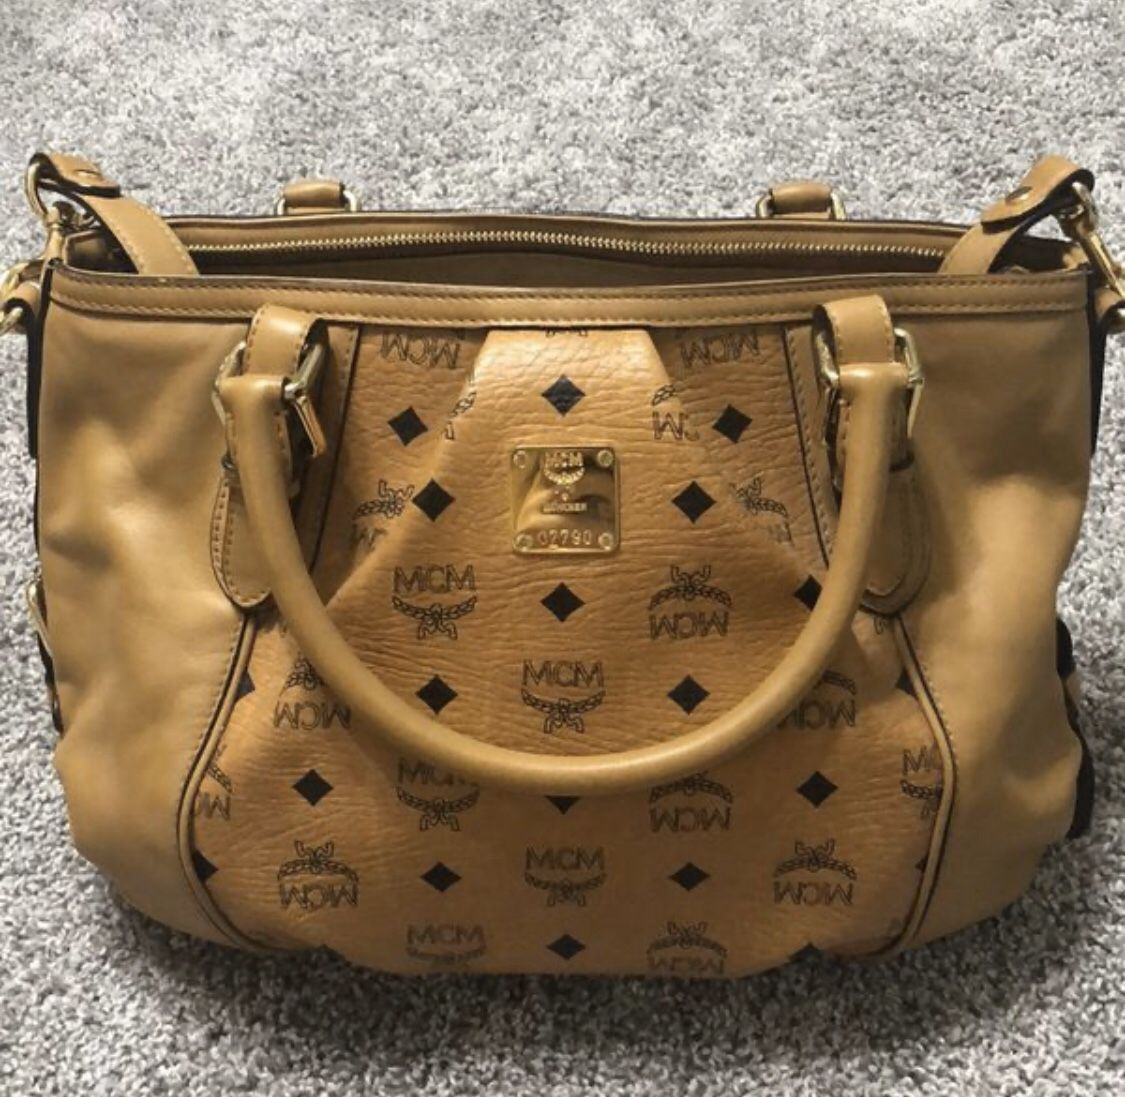 MCM authentic bag